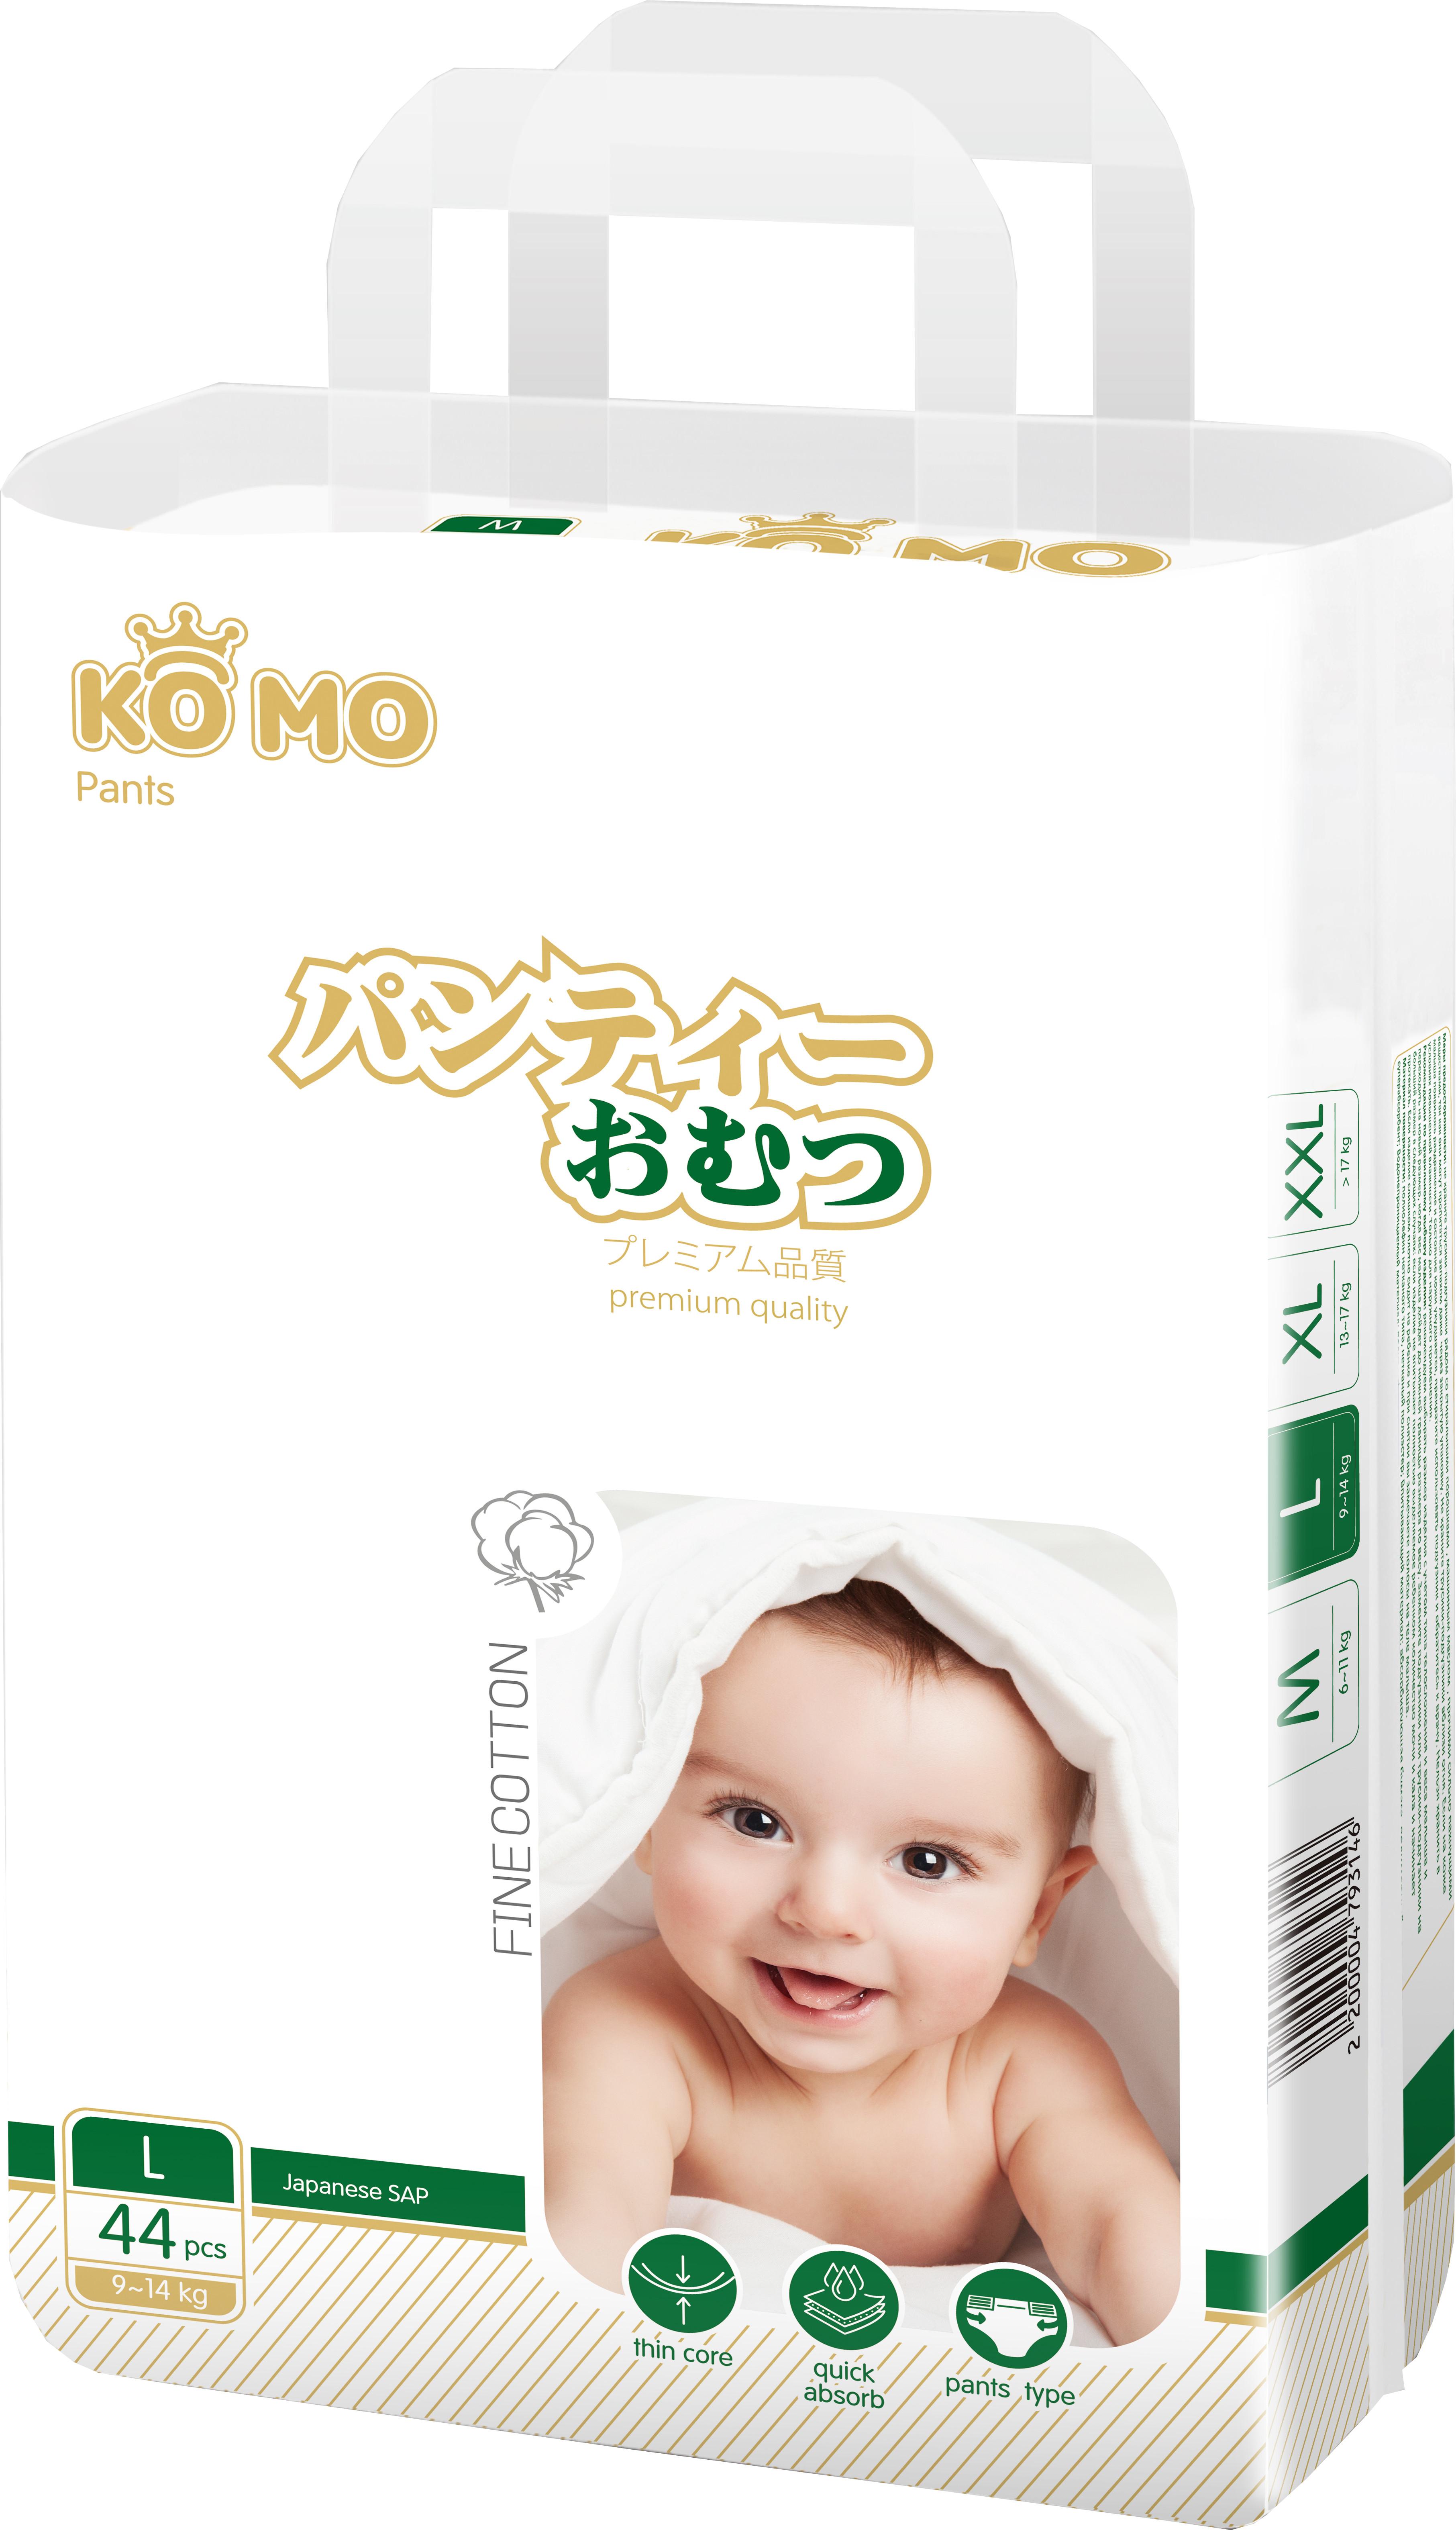 Купить Premium Quality, Трусики-подгузники Ko Mo L (9-14 кг) 44 шт., Подгузники-трусики